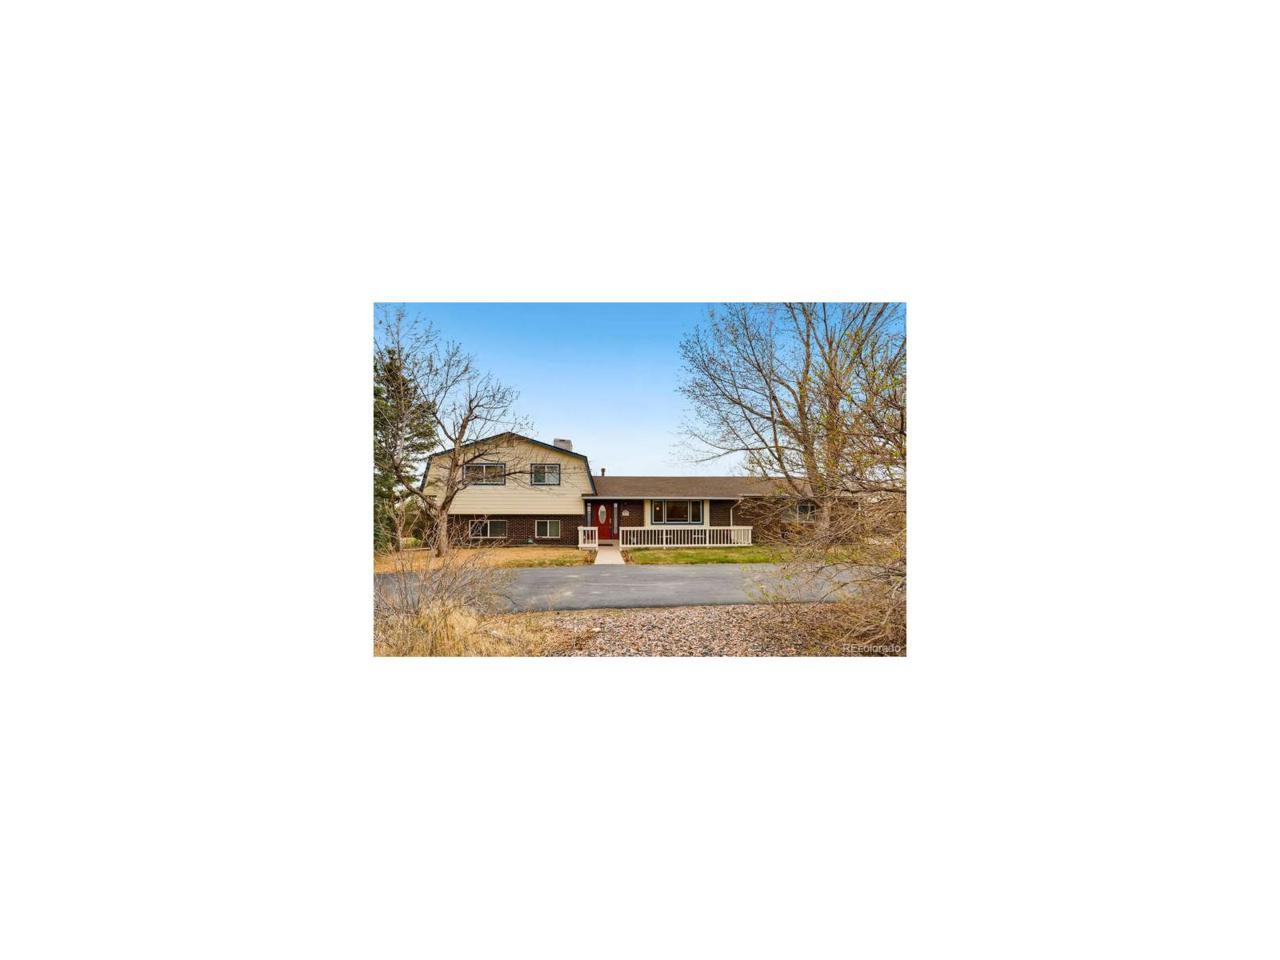 14630 Benton Street, Broomfield, CO 80020 (MLS #7651832) :: 8z Real Estate